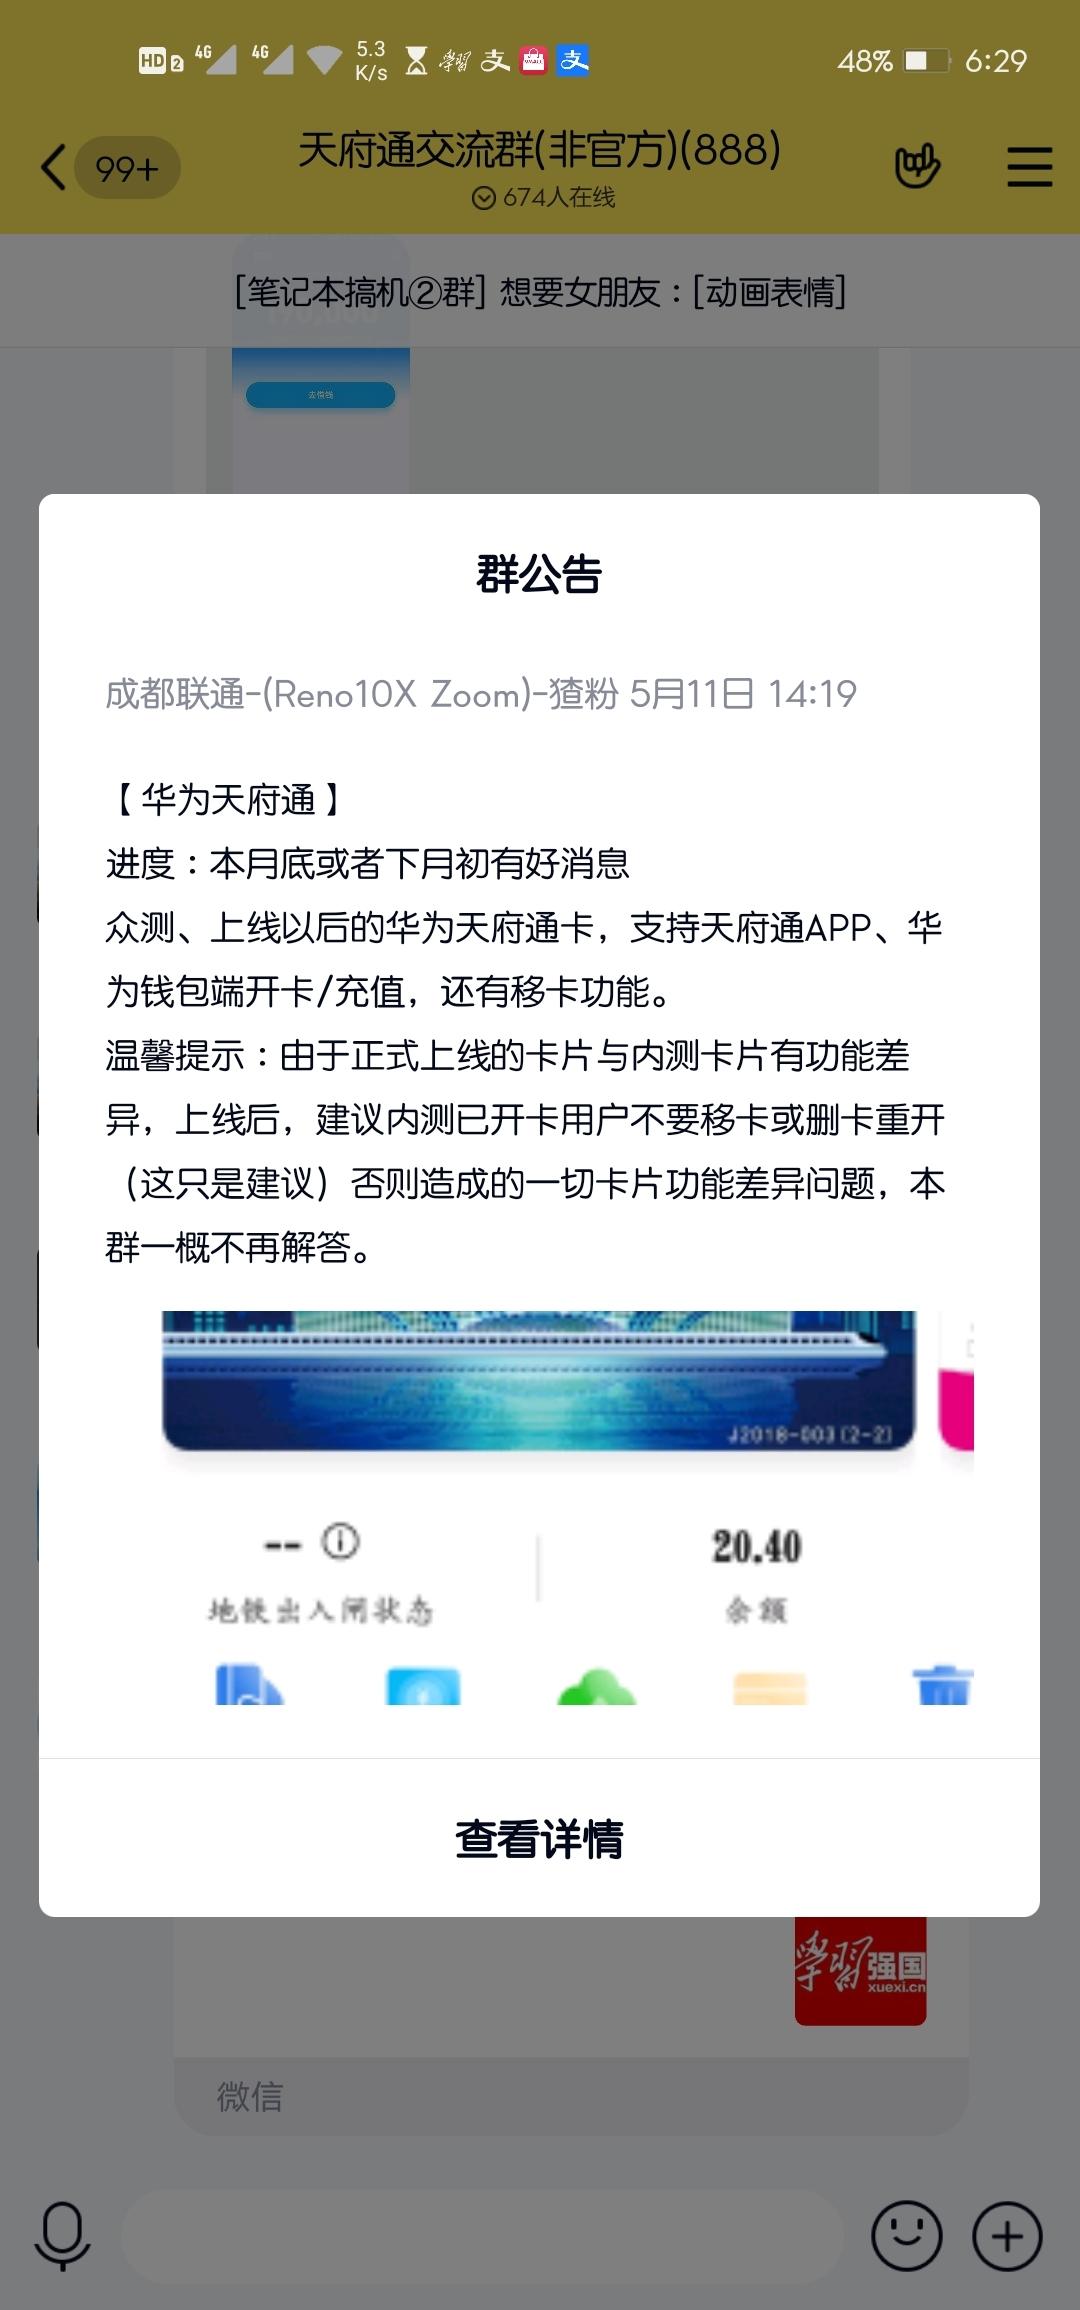 Screenshot_20200511_182901_com.tencent.mobileqq.jpg